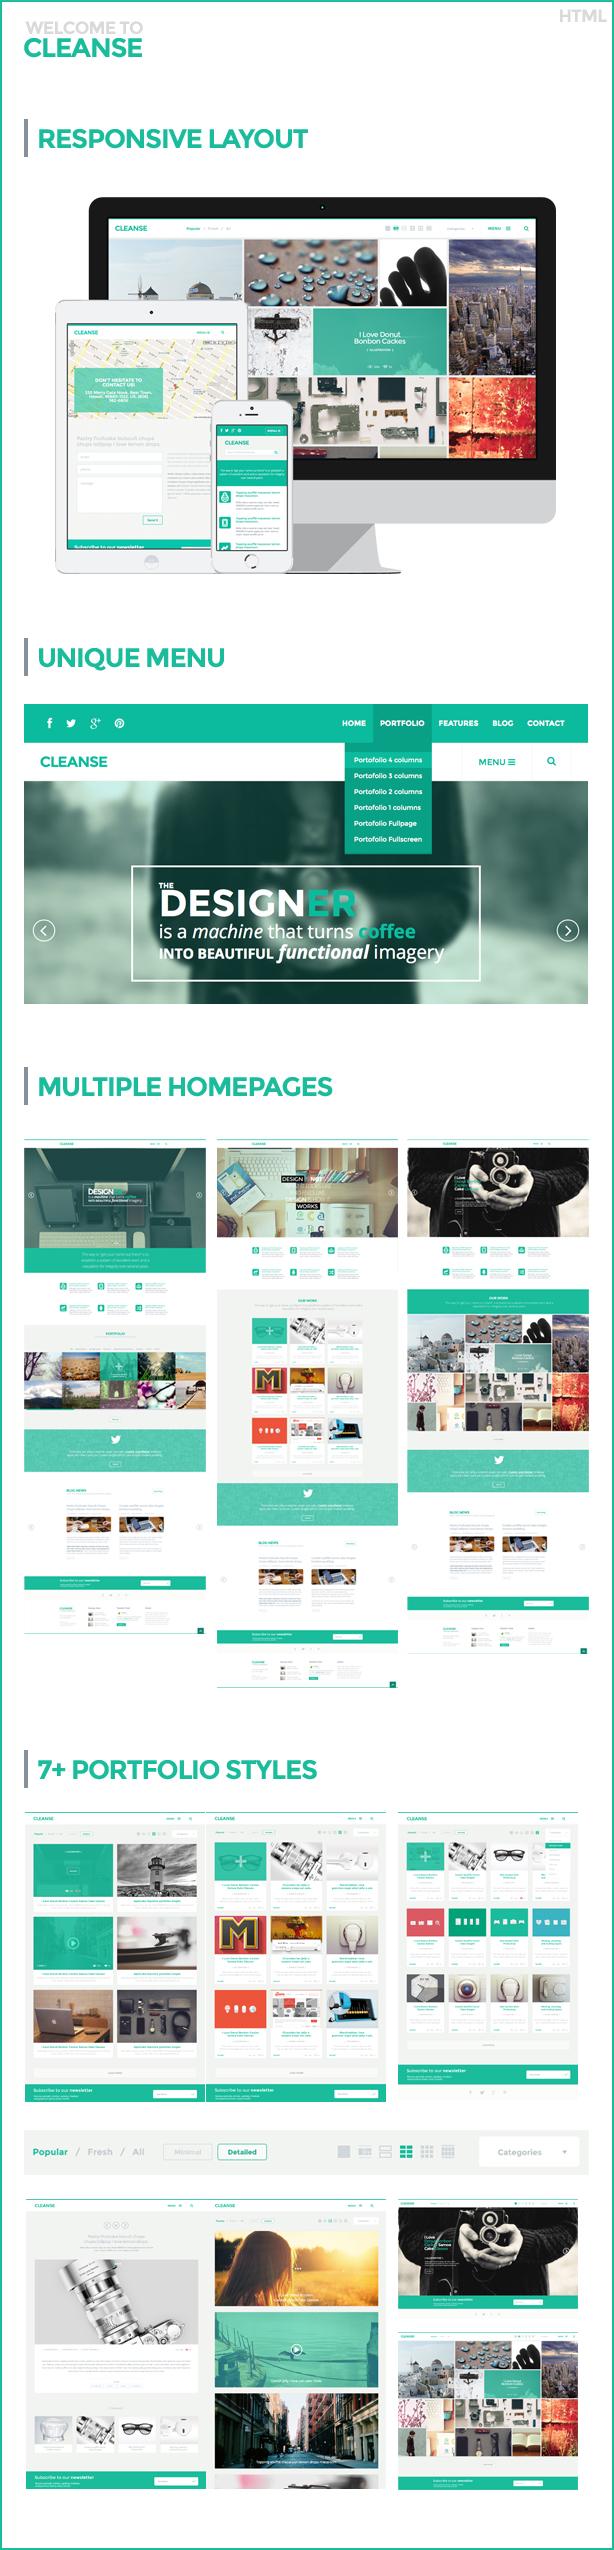 Cleanse - Minimal Portfolio HTML Template - 7